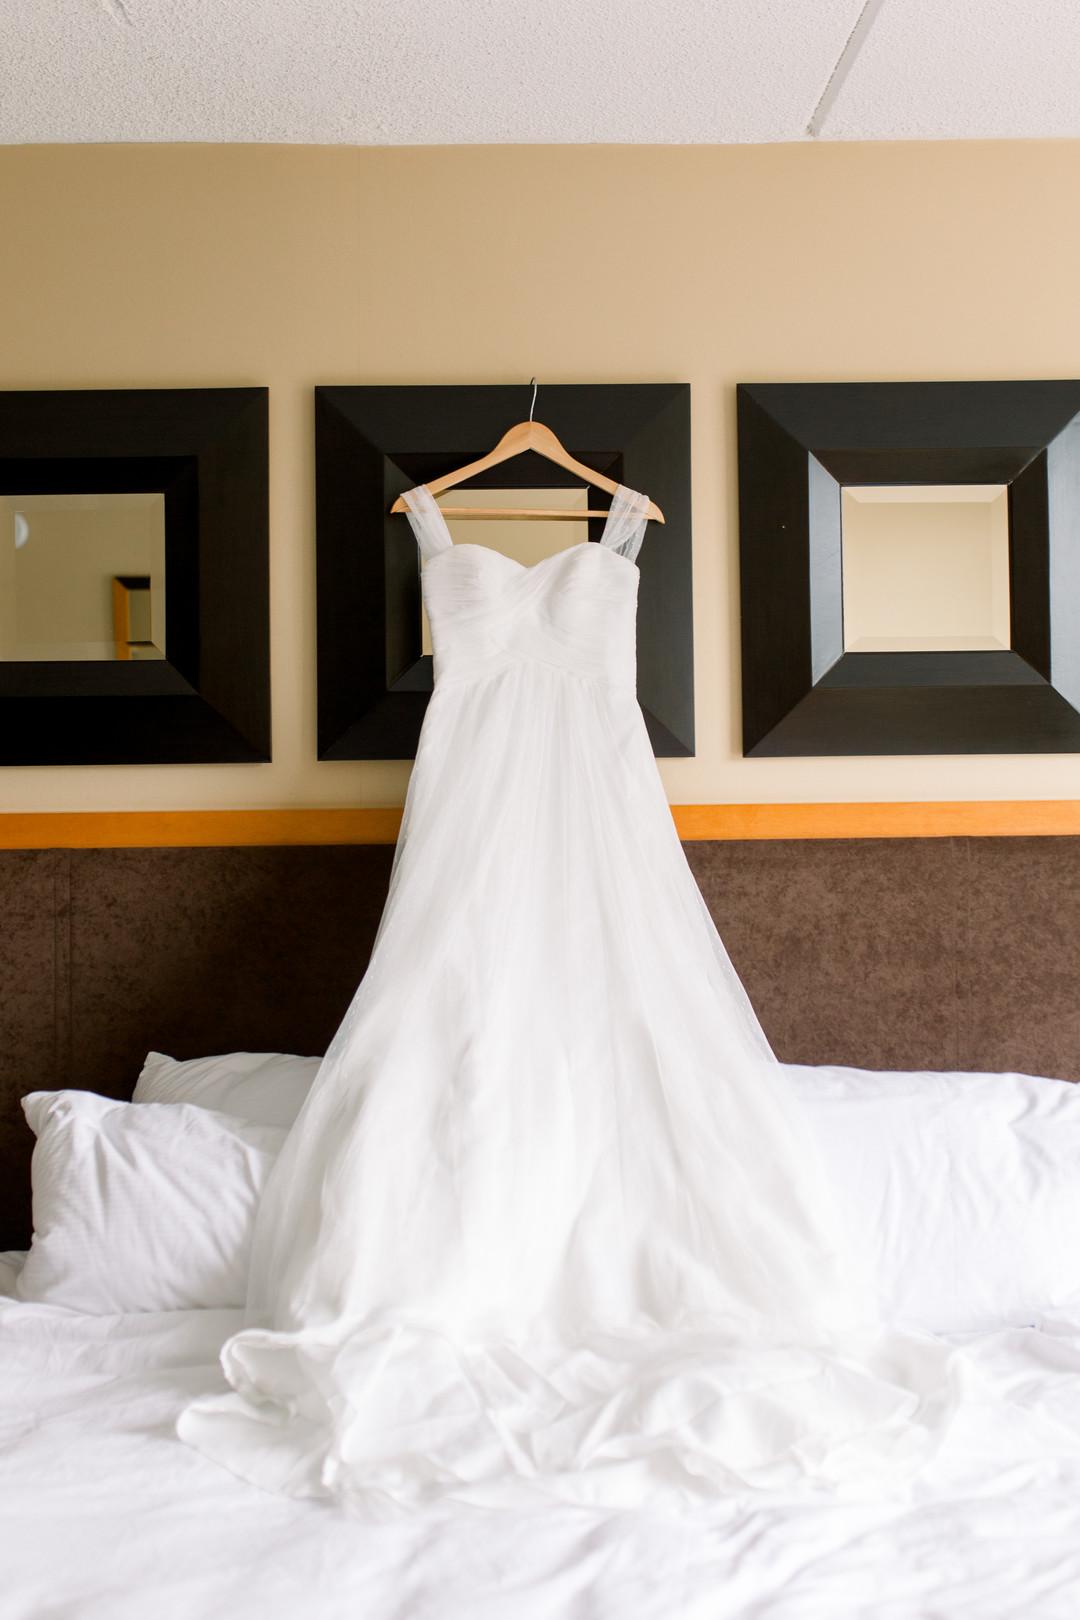 Elegant wedding dress: Spring wedding inspiration captured by Nicole Morisco Photography. Find more spring wedding ideas at CHItheeWED.com!